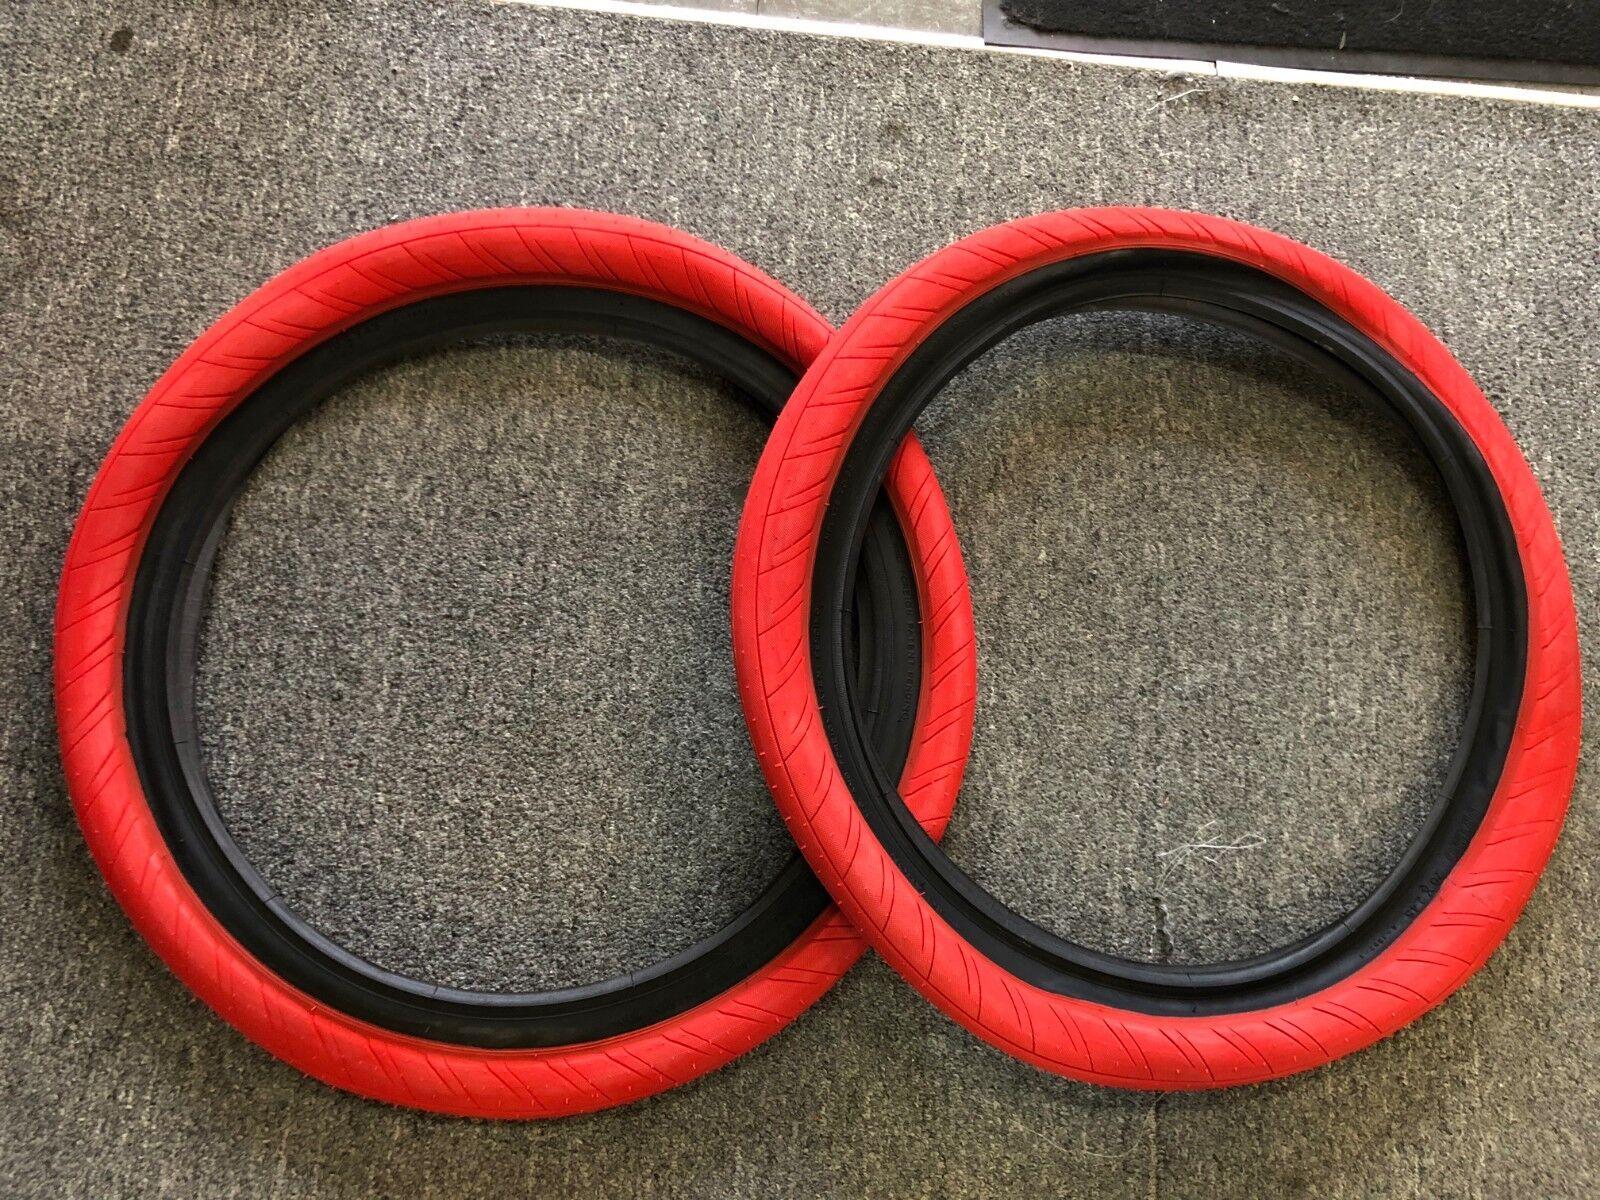 PAIR OF PRIMO  BMX STEVIE CHUR LL 20 X 2.45  BIKE TIRES RED  free shipping!